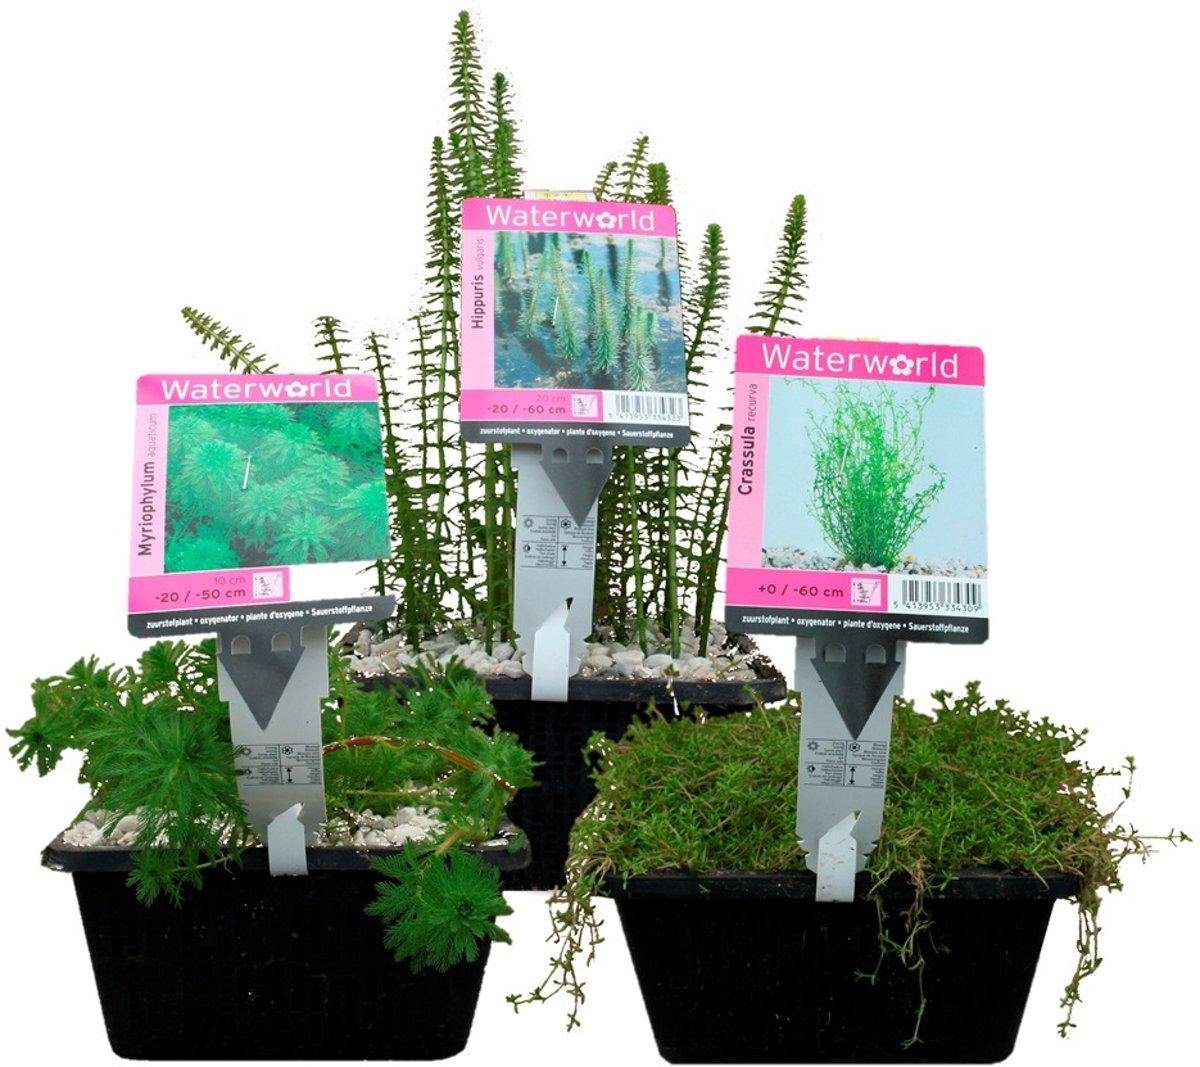 Waterworld Waterzuiverende Zuurstofplanten Pakket - Ca. 2m³ Water - 12 Waterplanten + 3 Oppot Sets (Vijvermandje, Klei, Grind & Voeding) kopen